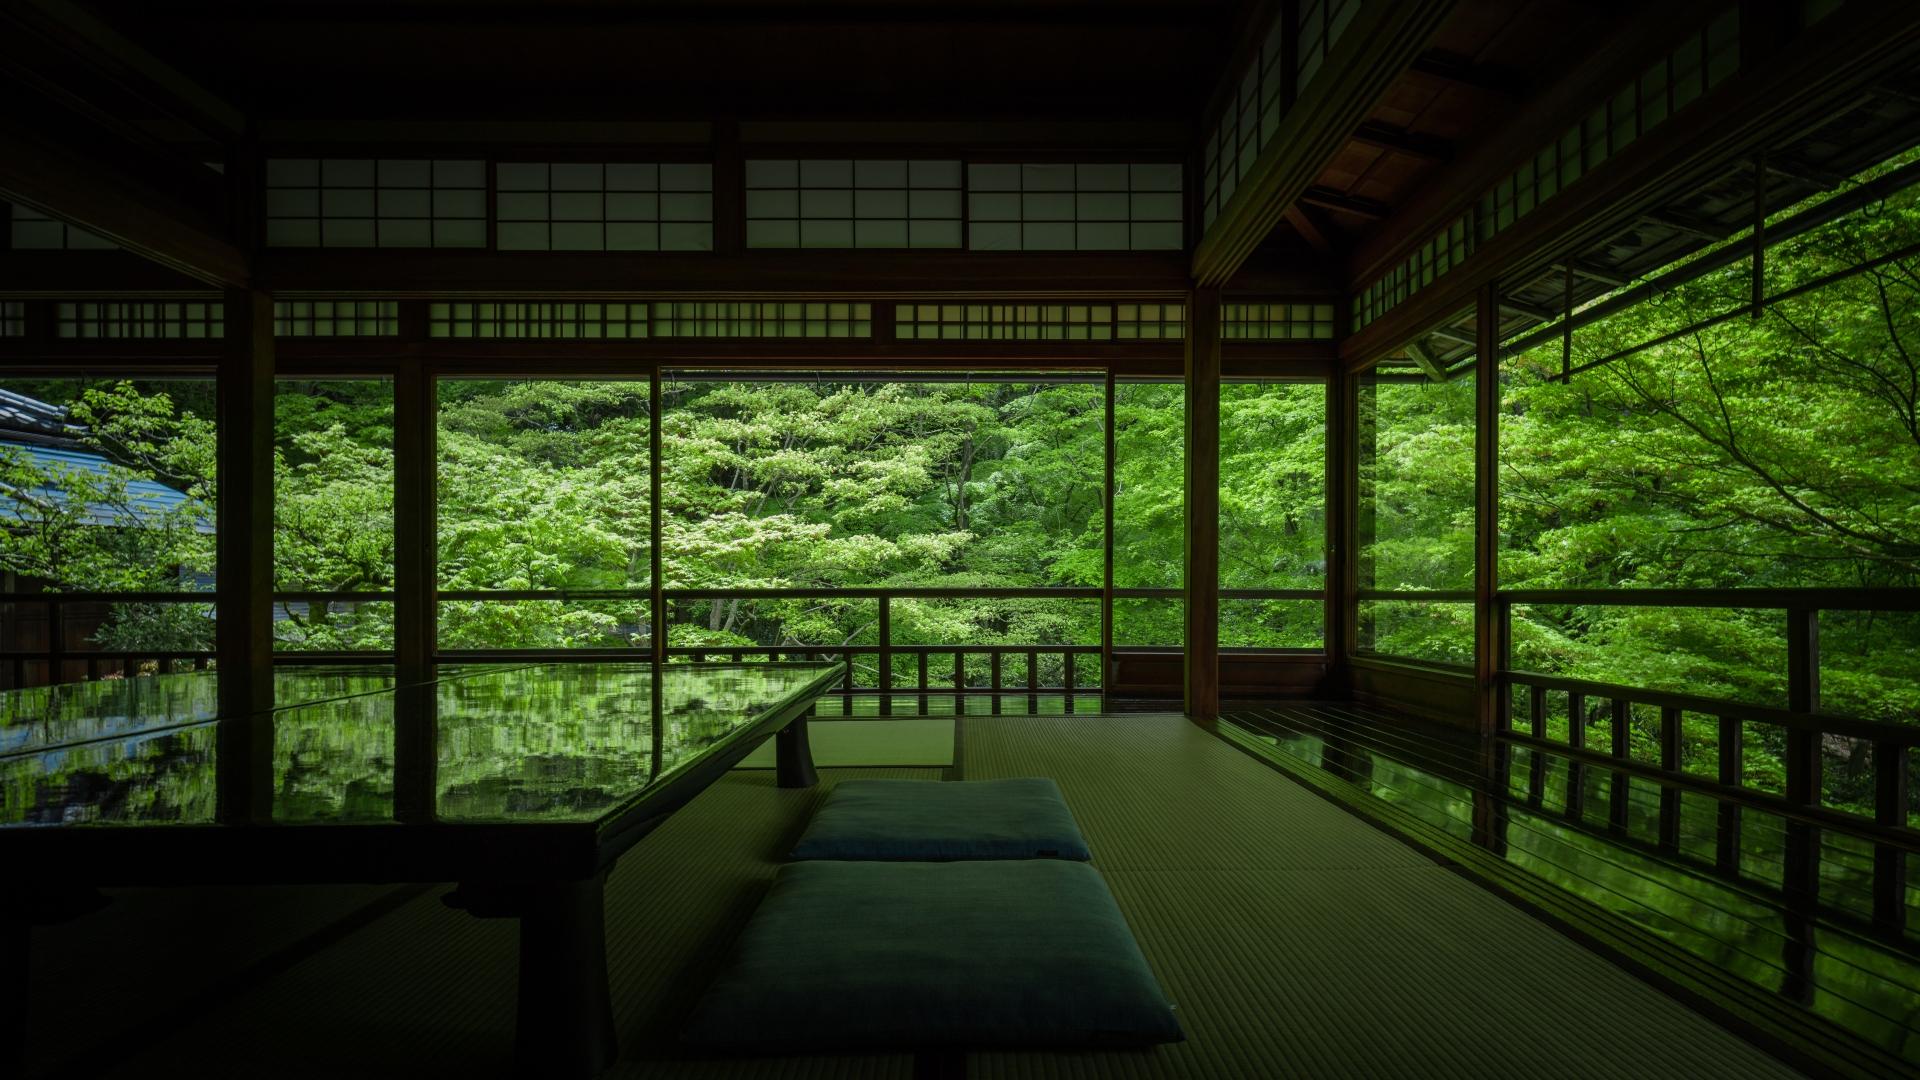 3926134_m 京都  瑠璃光院(京都の夏、新緑の時期におすすめのスポット!写真の紹介、アクセス情報など)